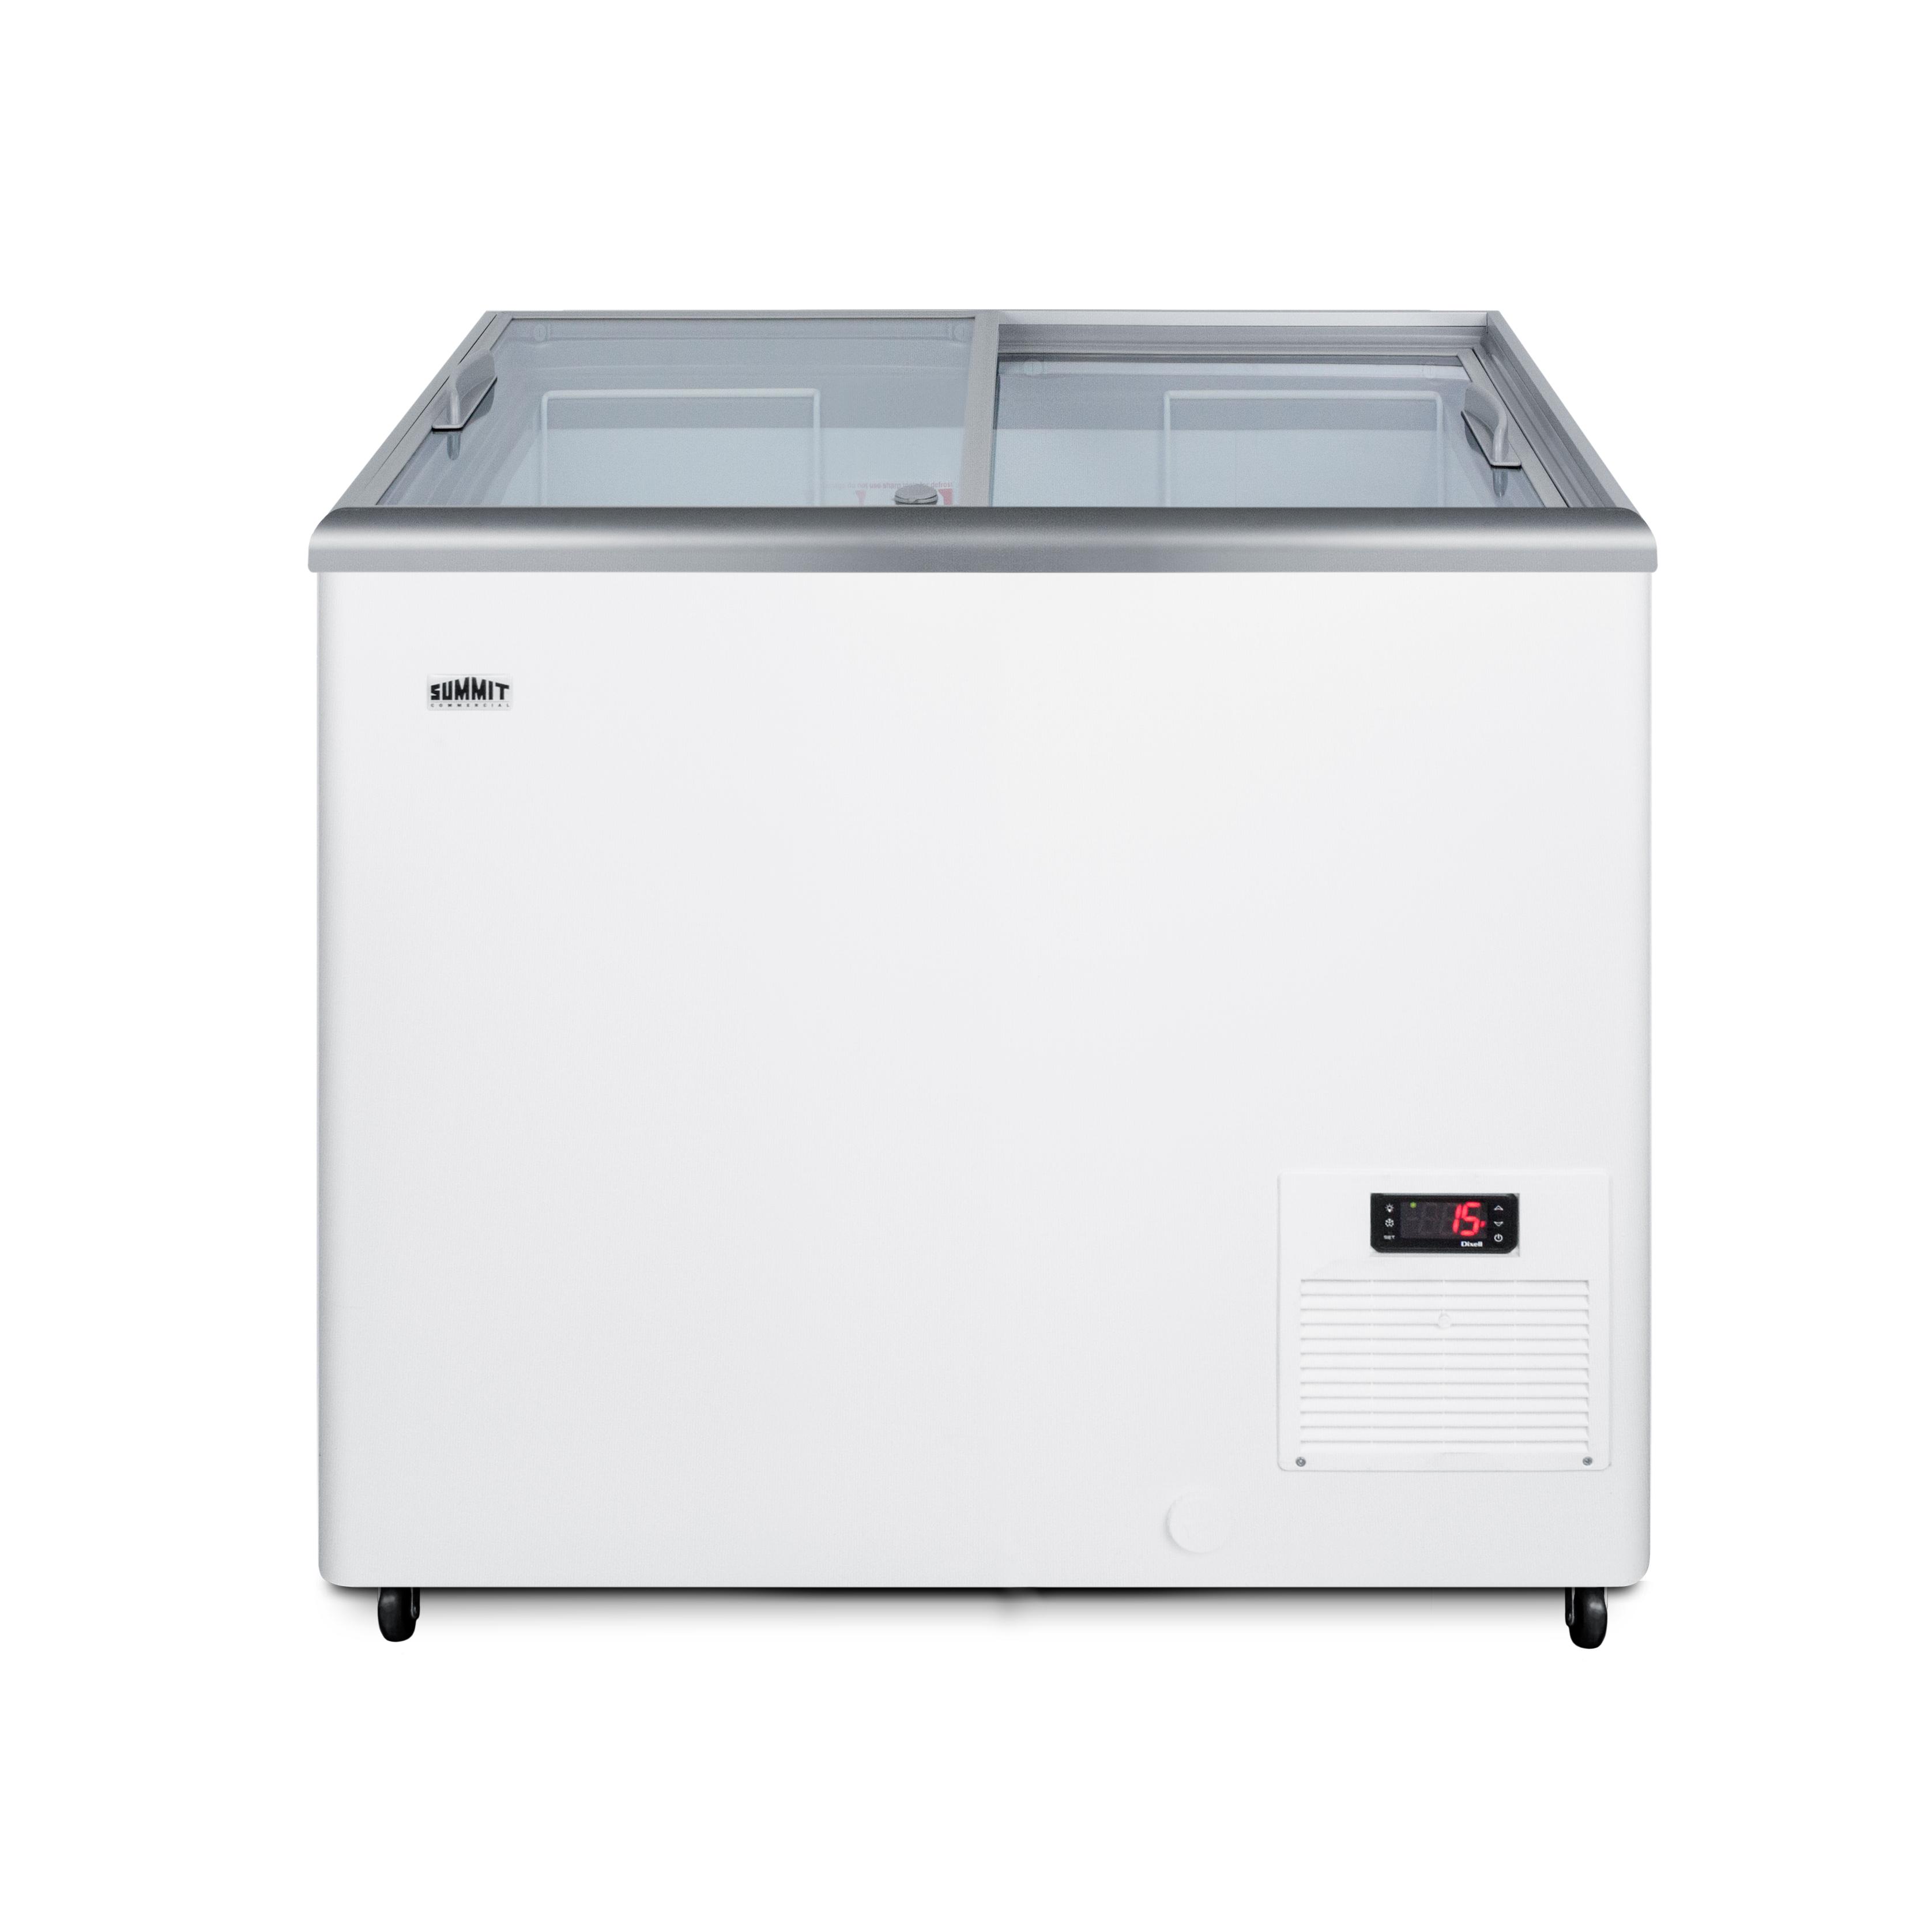 Summit Appliance NOVA22 chest freezer